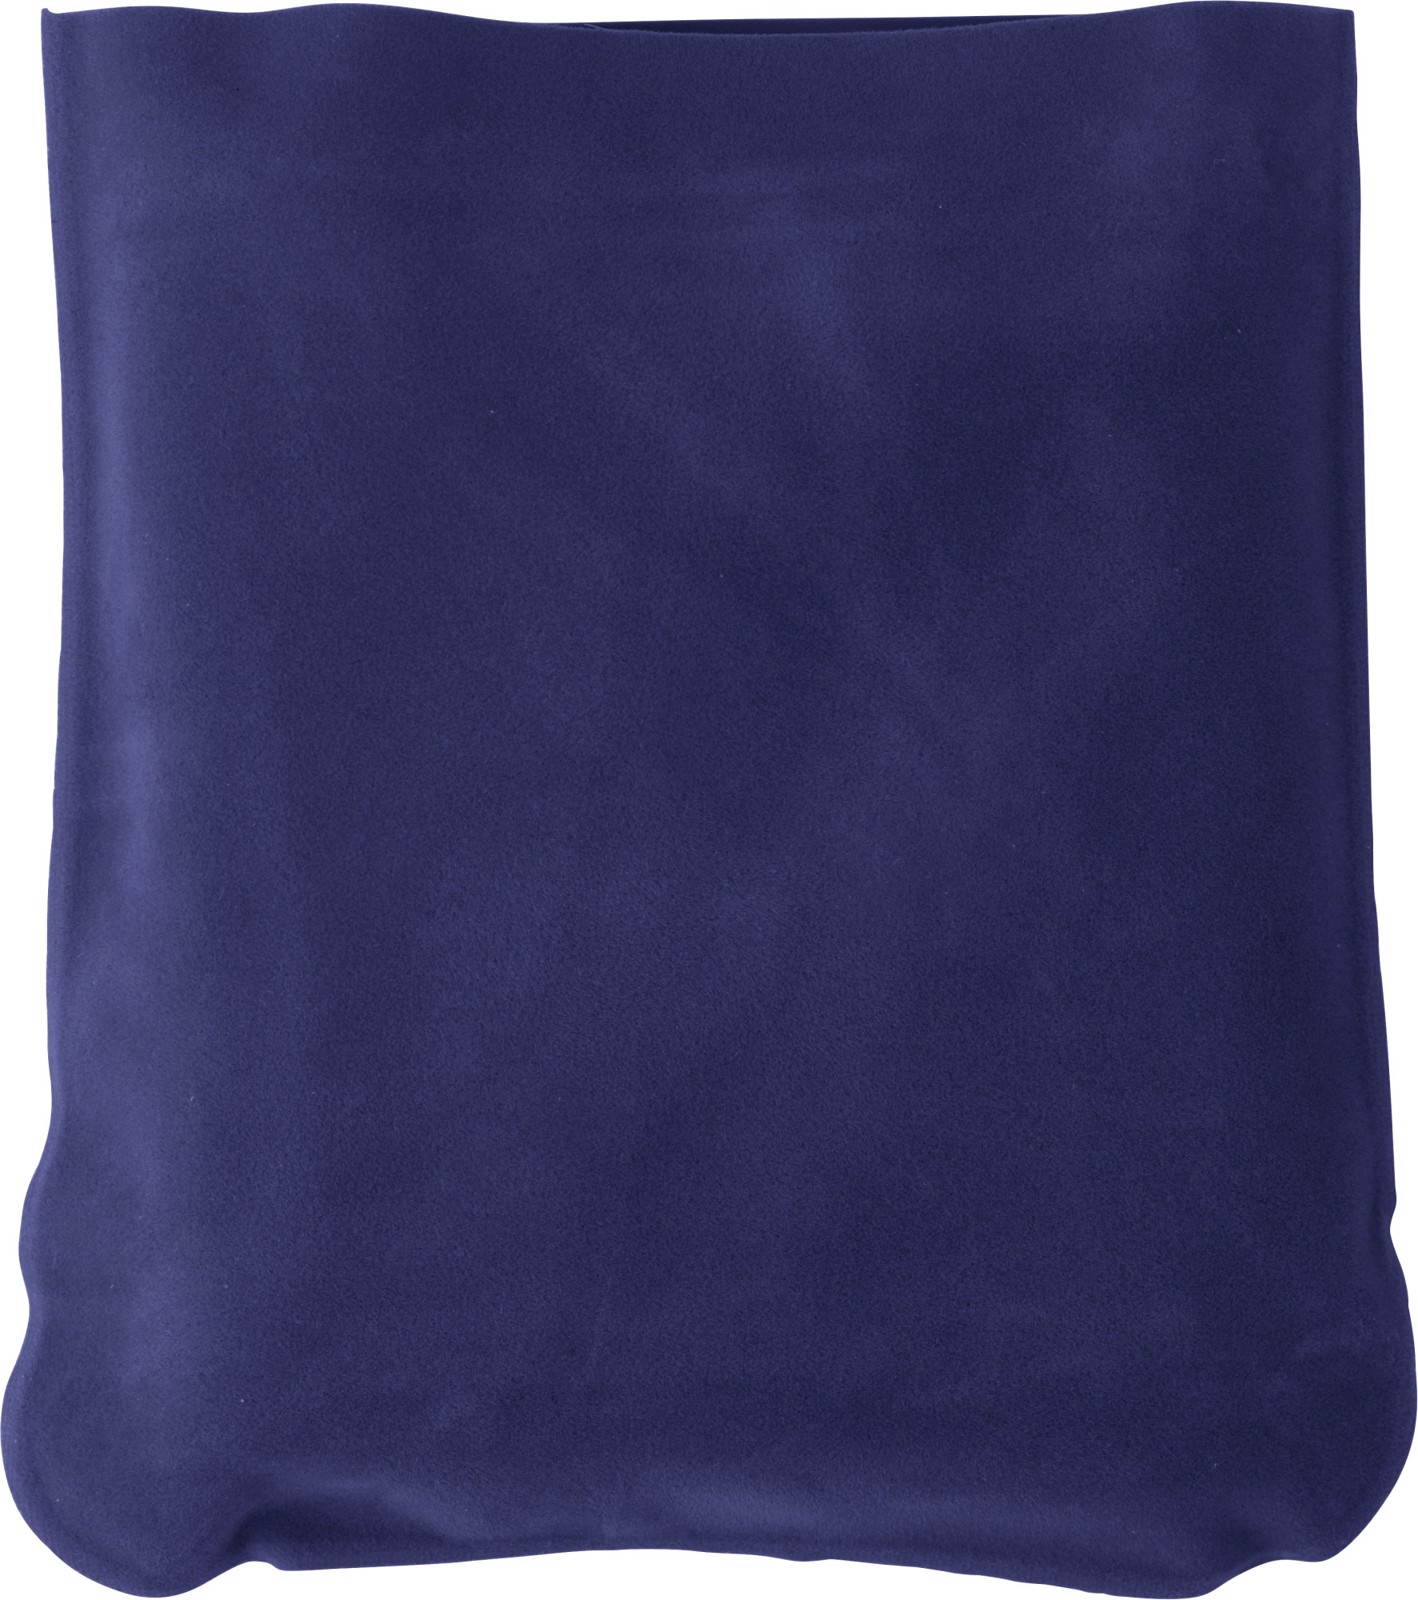 Velour travel cushion - Blue